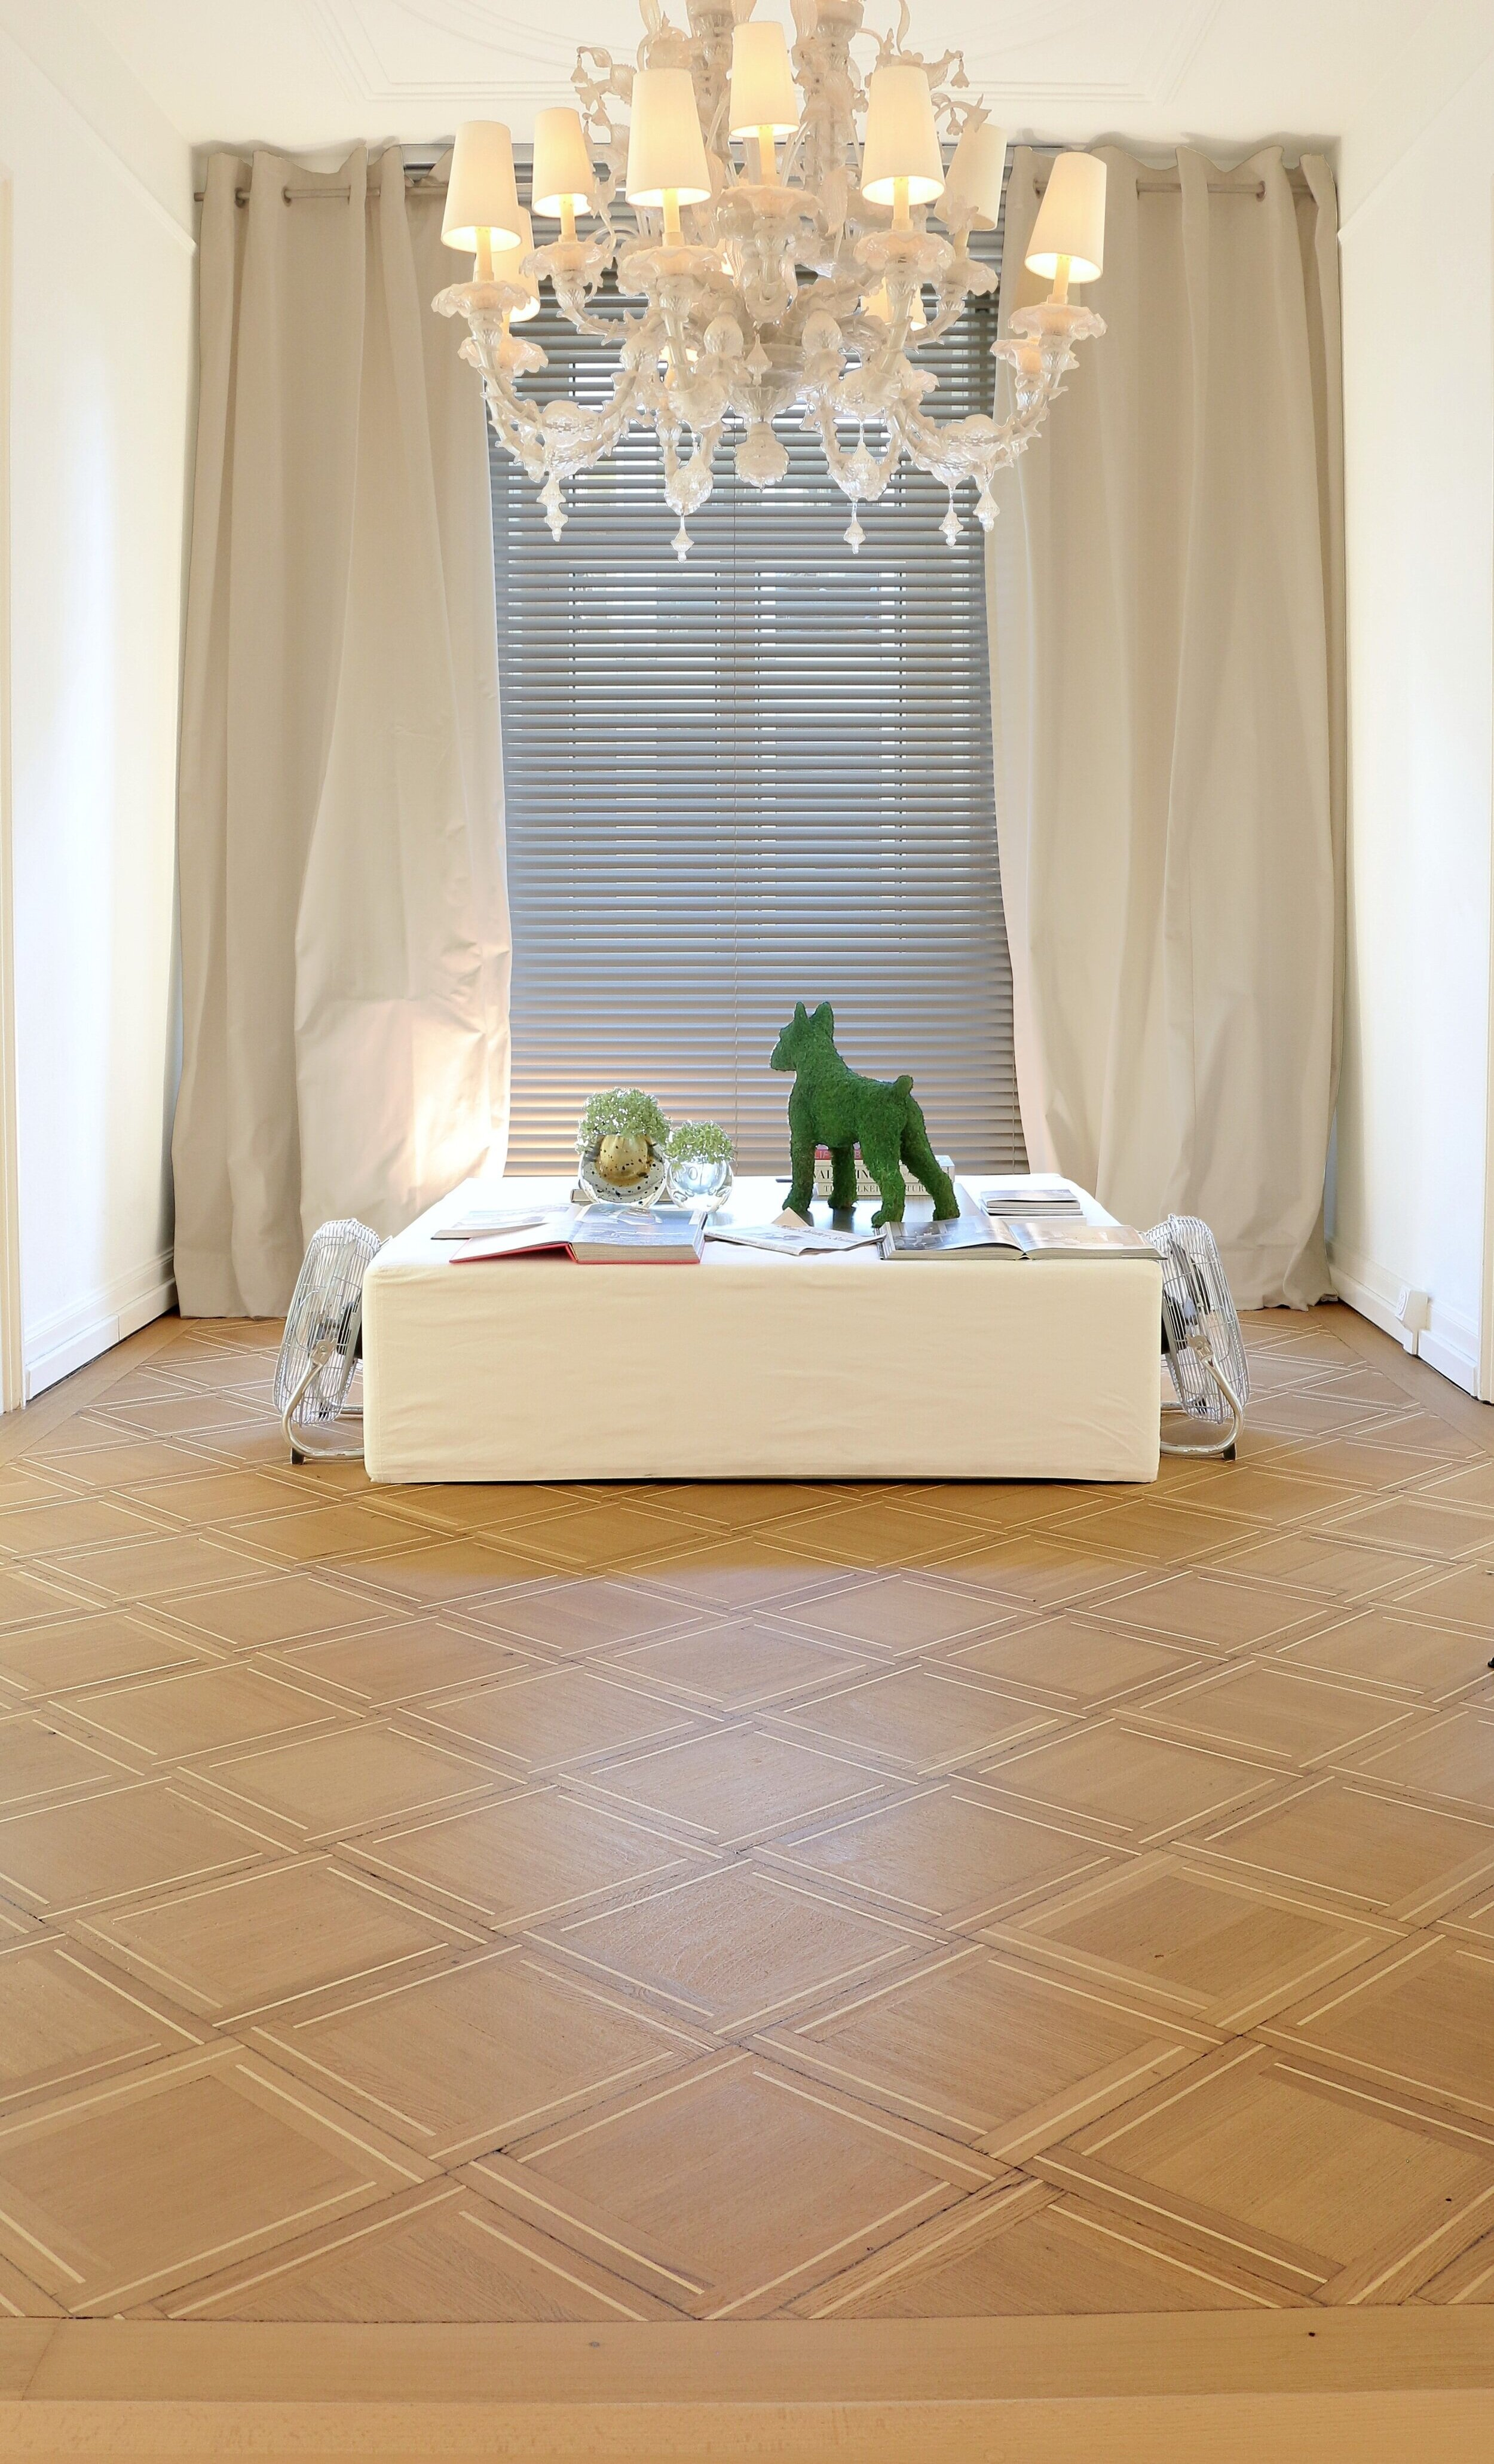 Ryser Boeden Charles Aellen Salon Toedistrasse 2 Coiffeur Lounge Entree Kronleuchter.jpeg